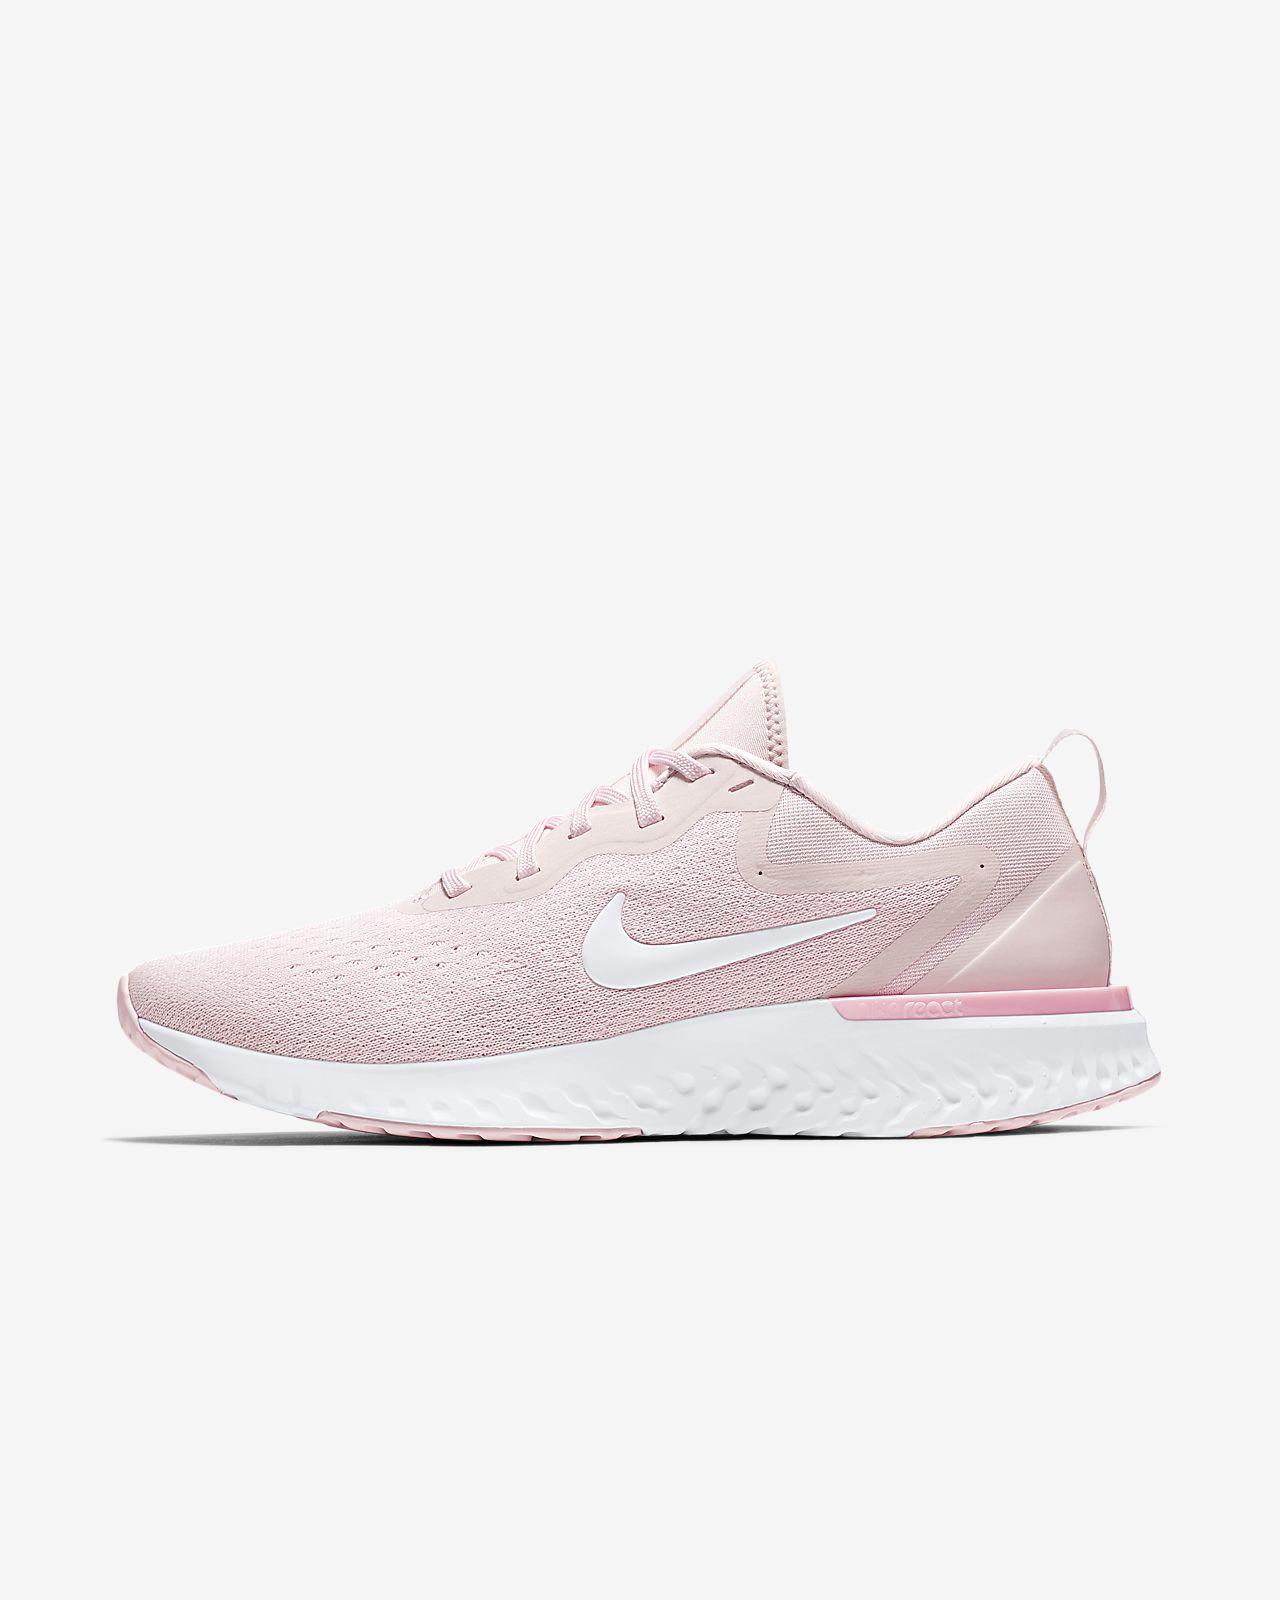 Nike Lunarepic Low Flyknit 2 Chaussures De Running Pour Femmes